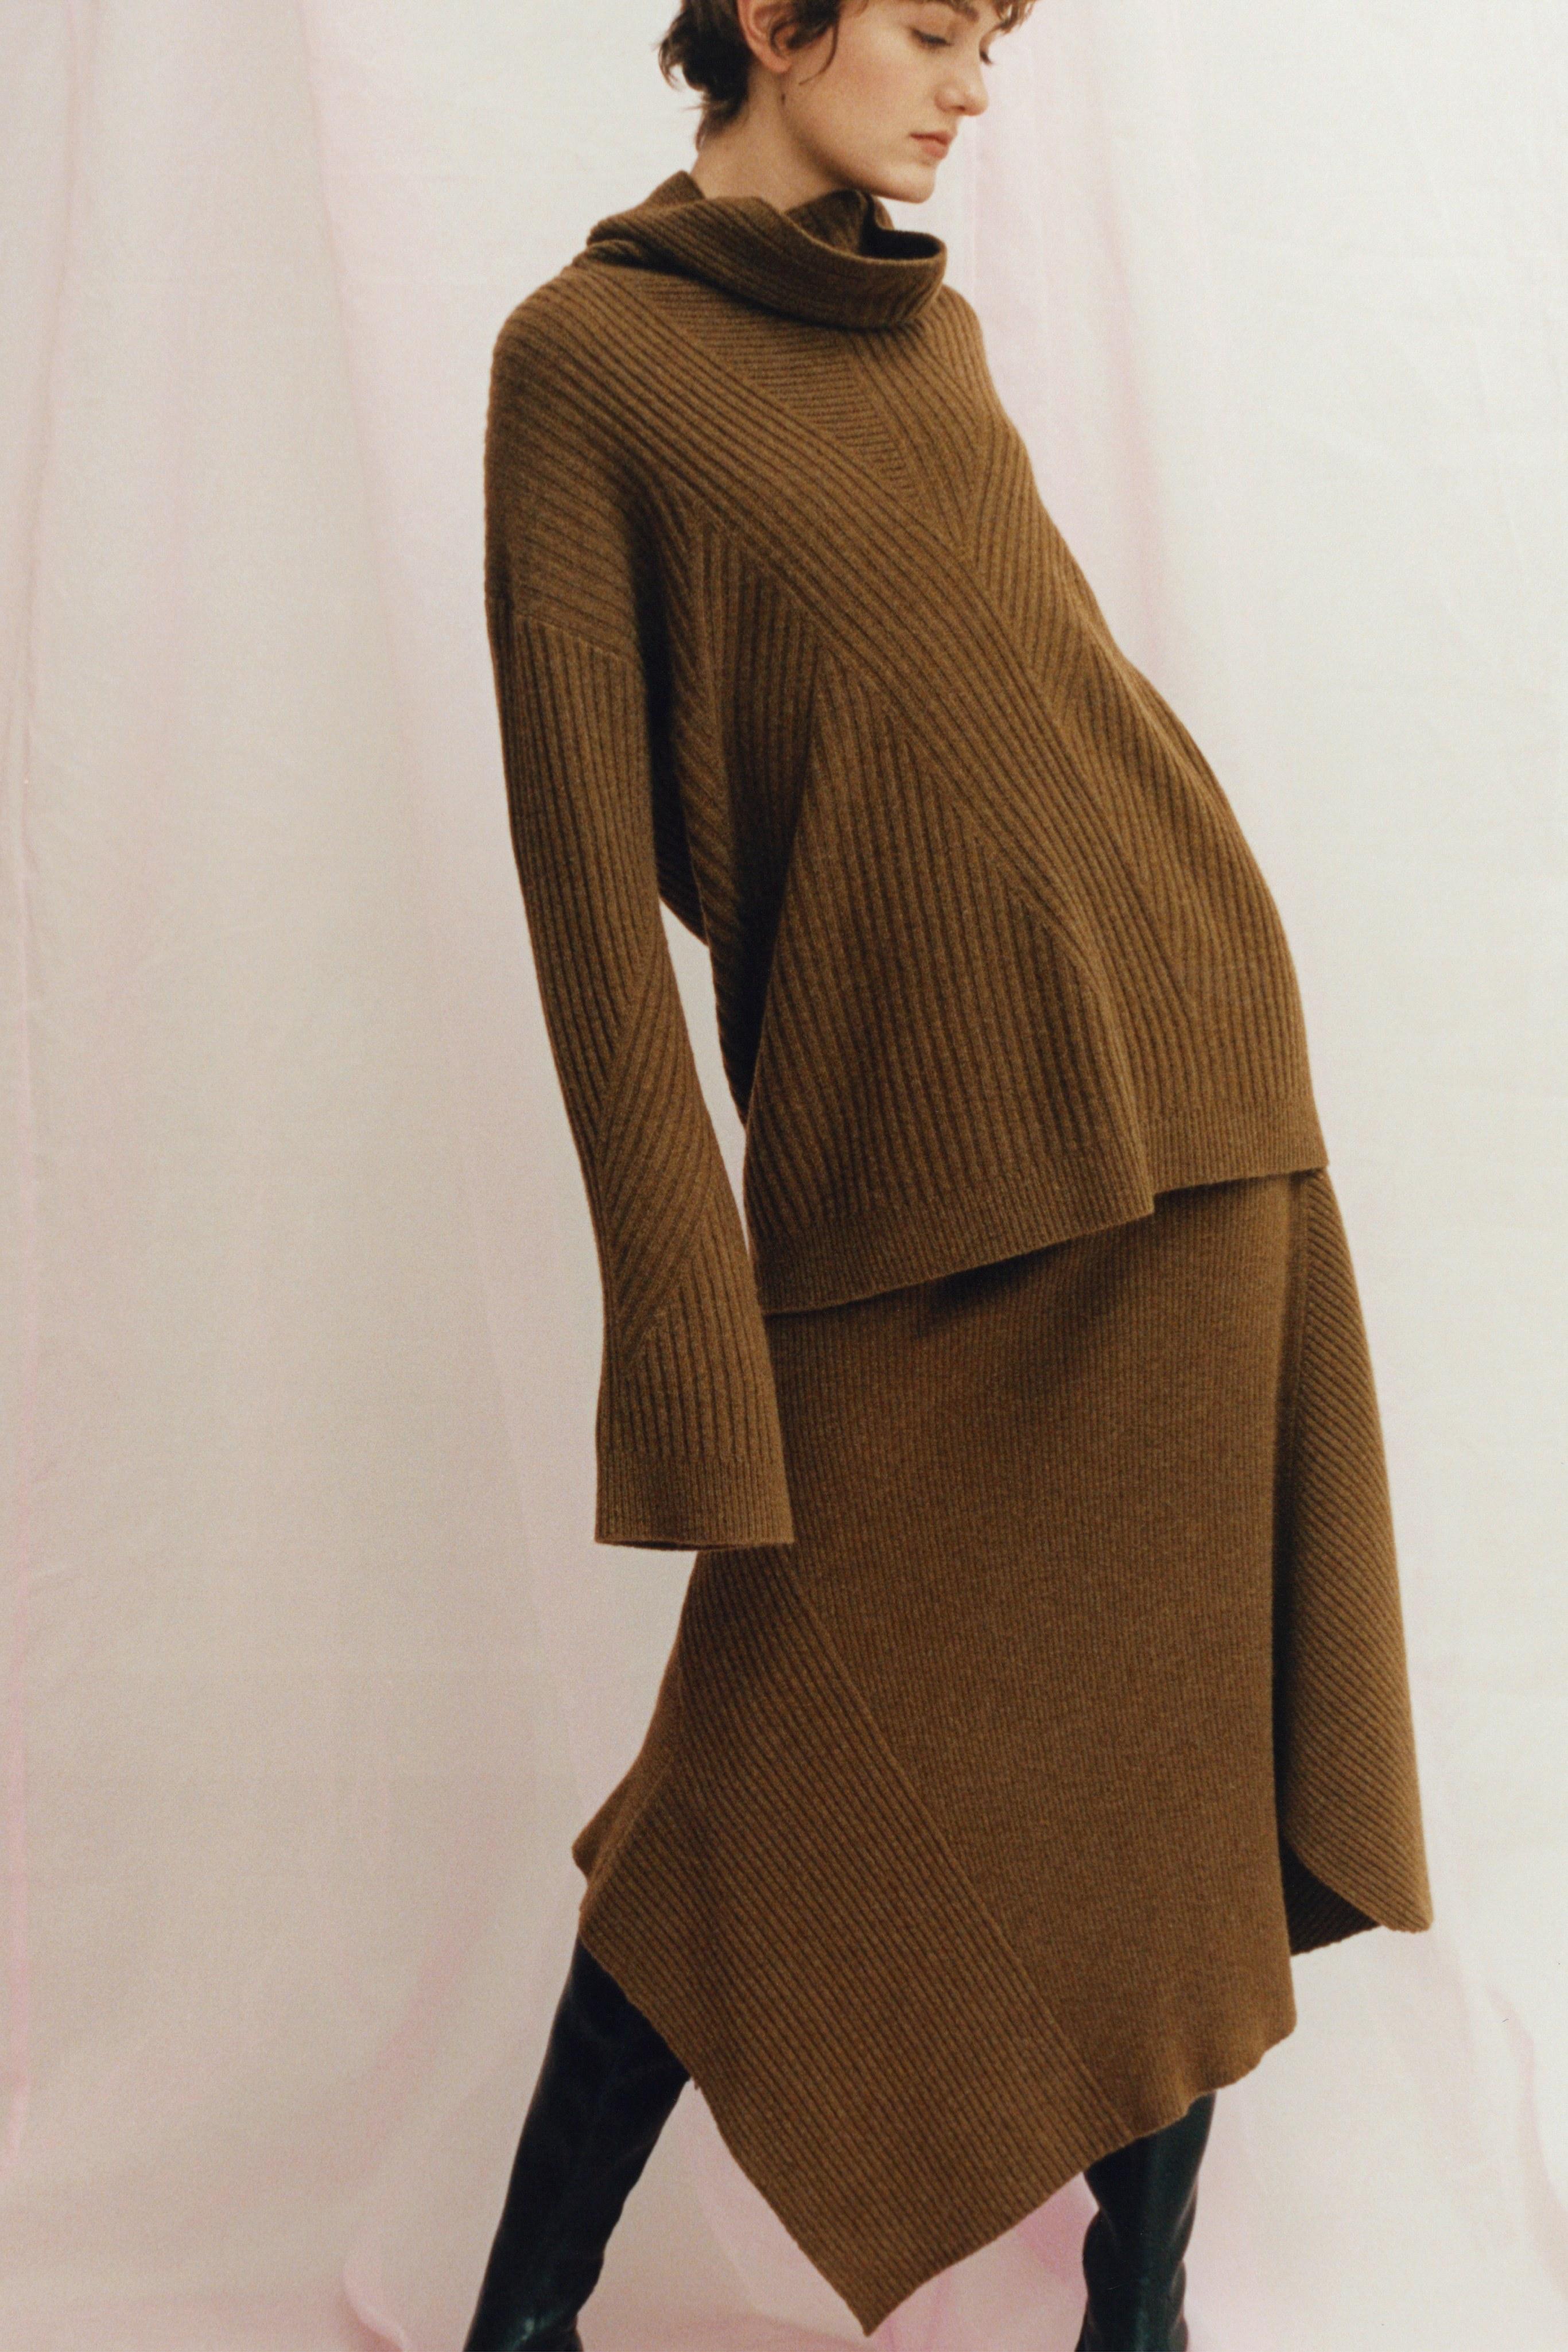 Design Model Gamis Seragam Pernikahan D0dg Pringle Of Scotland Pre Fall 2019 Collection Vogue